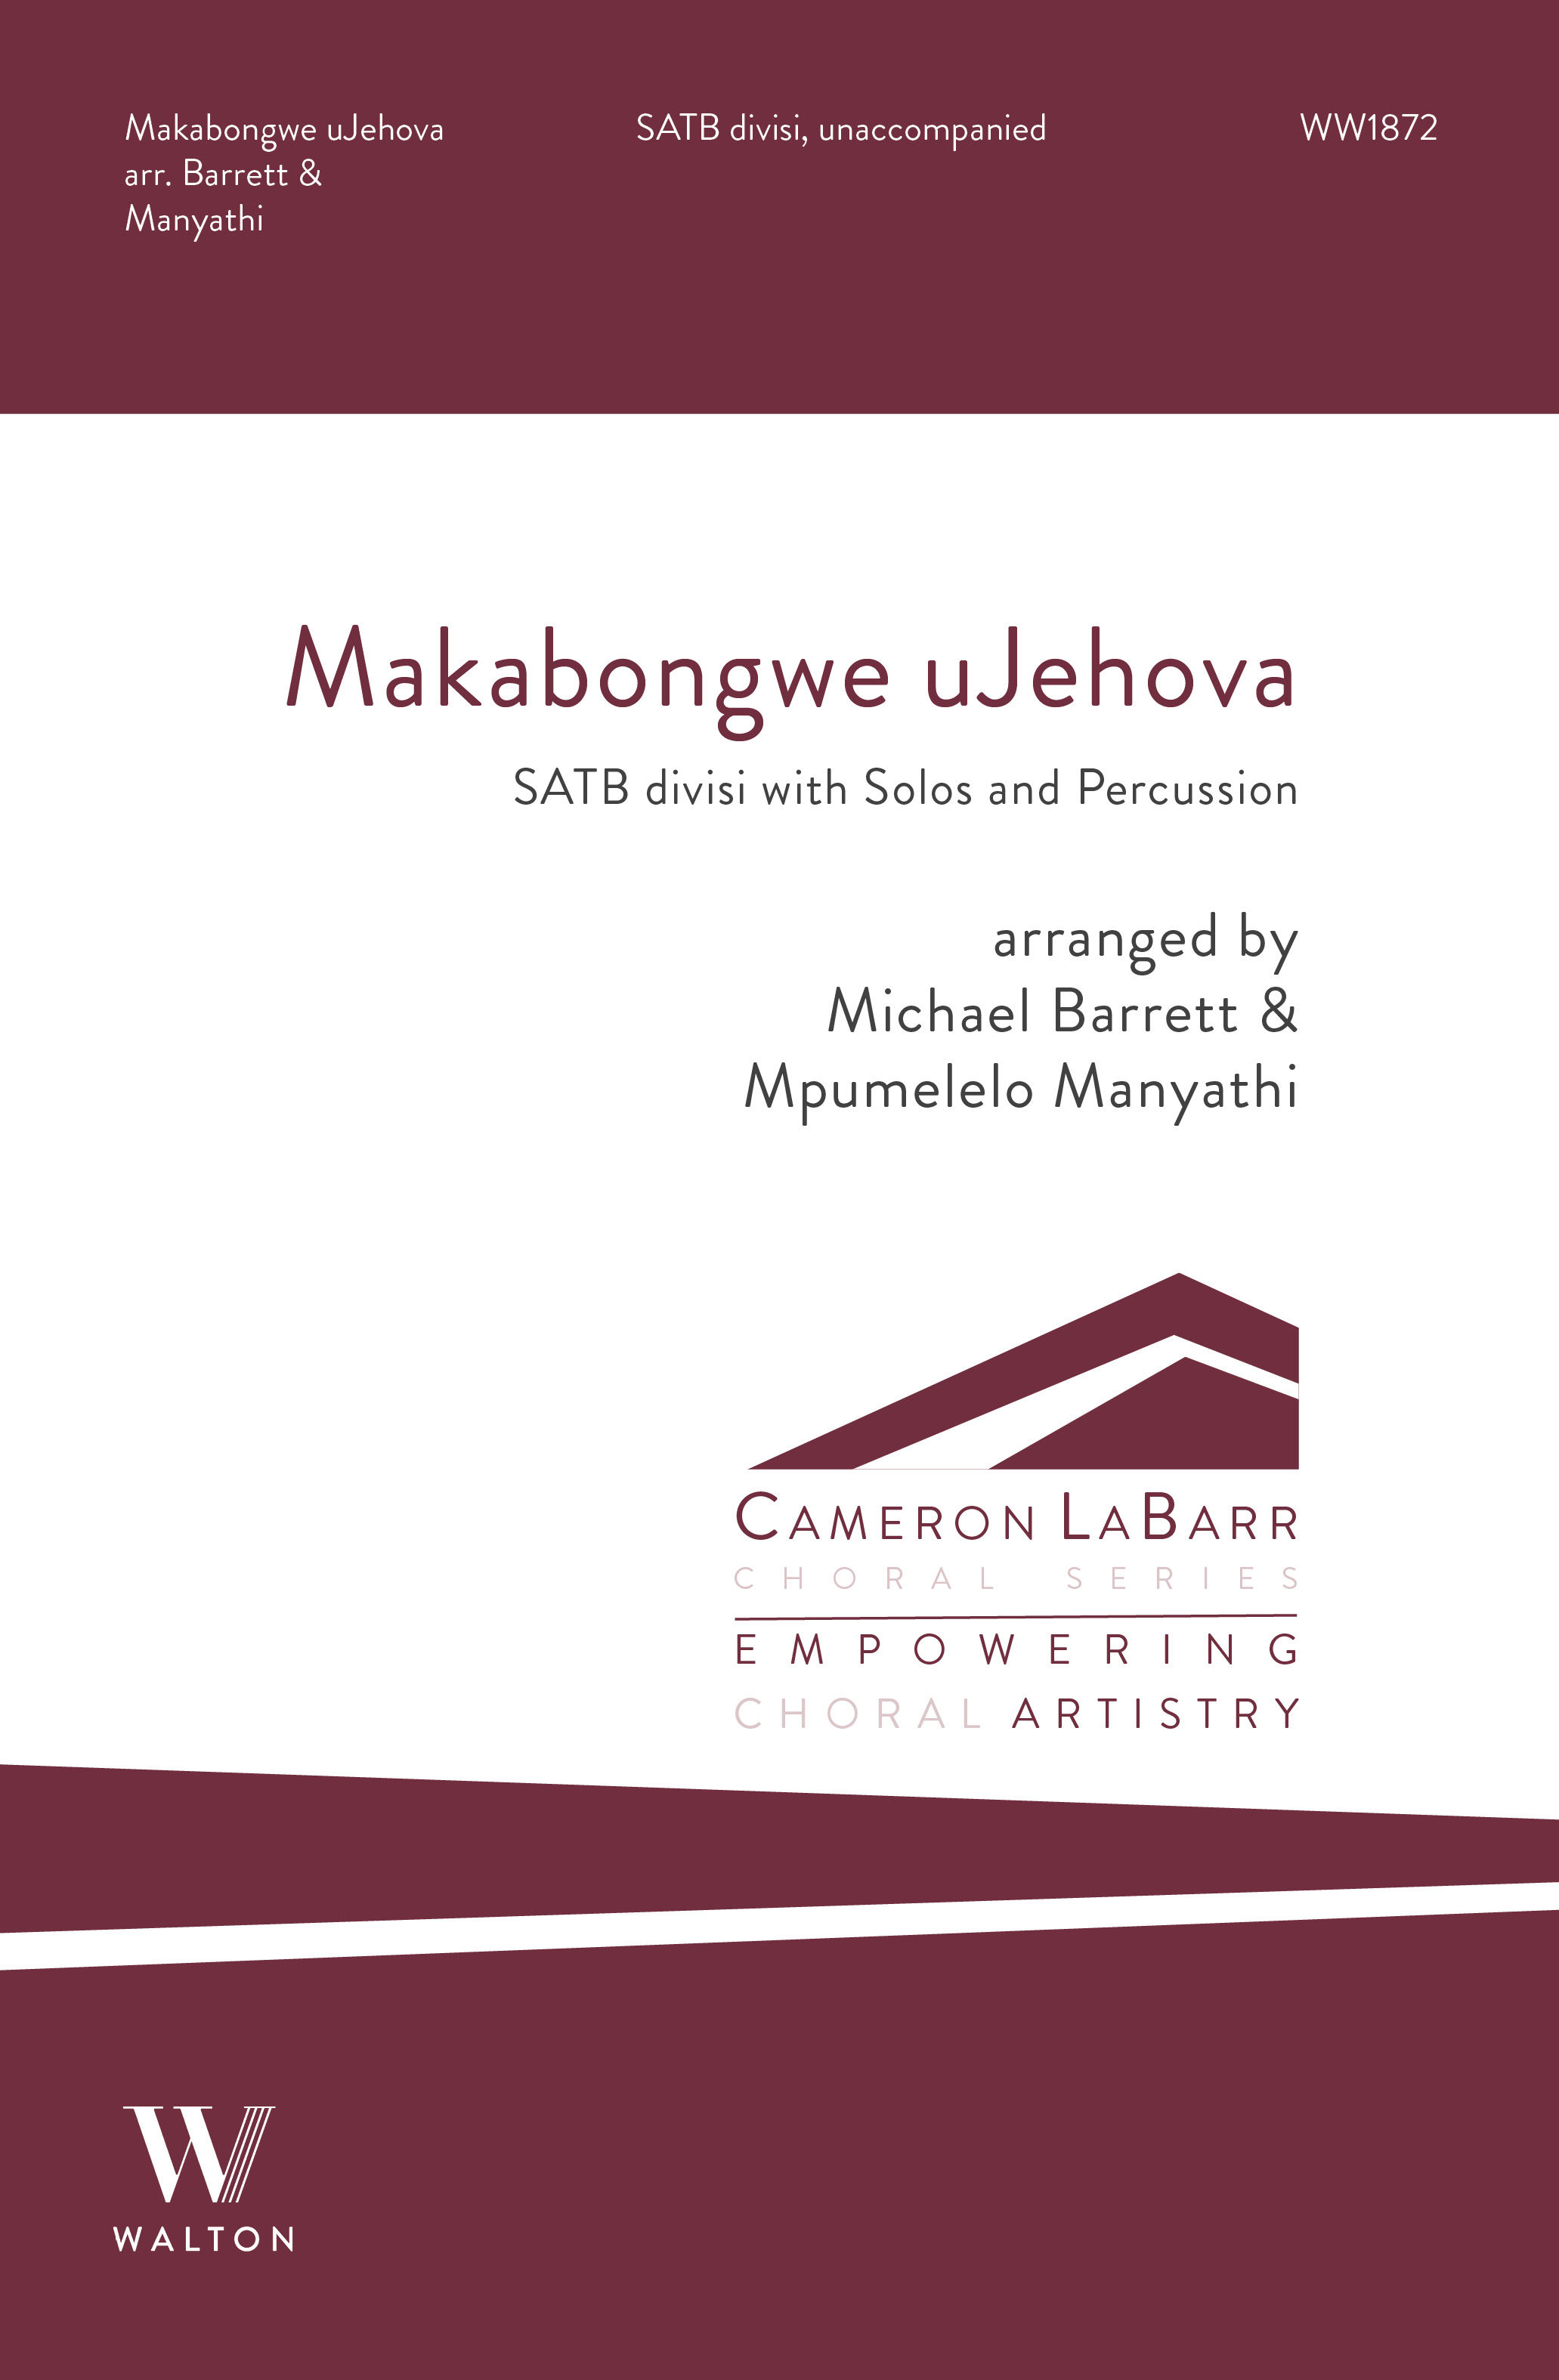 Makabongwe uJehova: Mixed Choir A Cappella: Choral Score